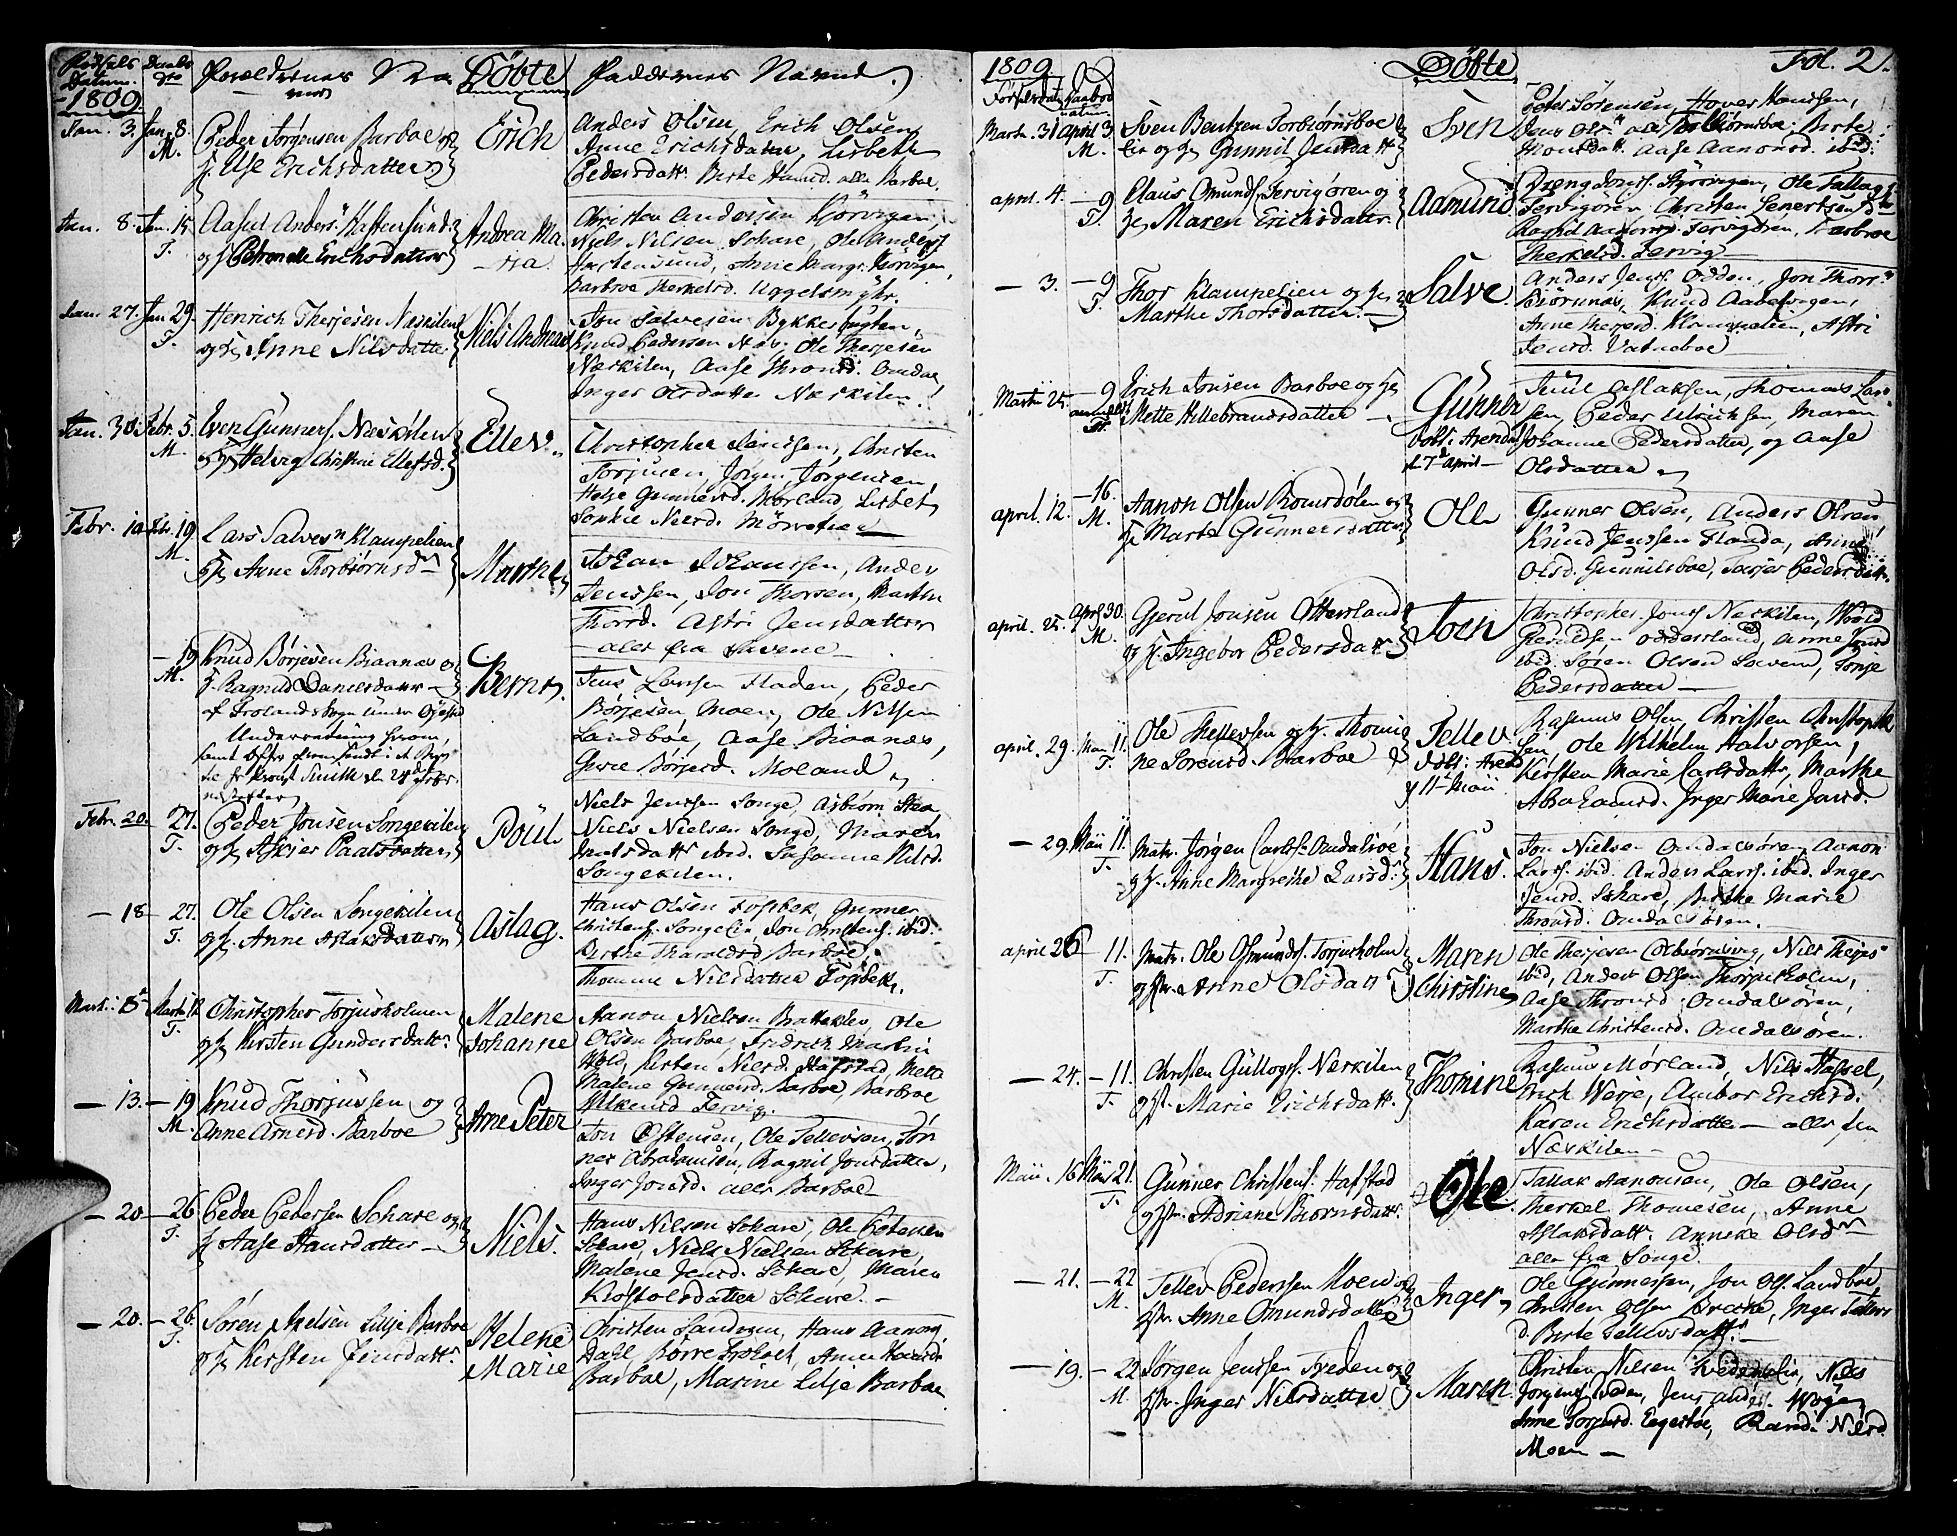 SAK, Austre Moland sokneprestkontor, F/Fa/Faa/L0003: Ministerialbok nr. A 3, 1808-1815, s. 2